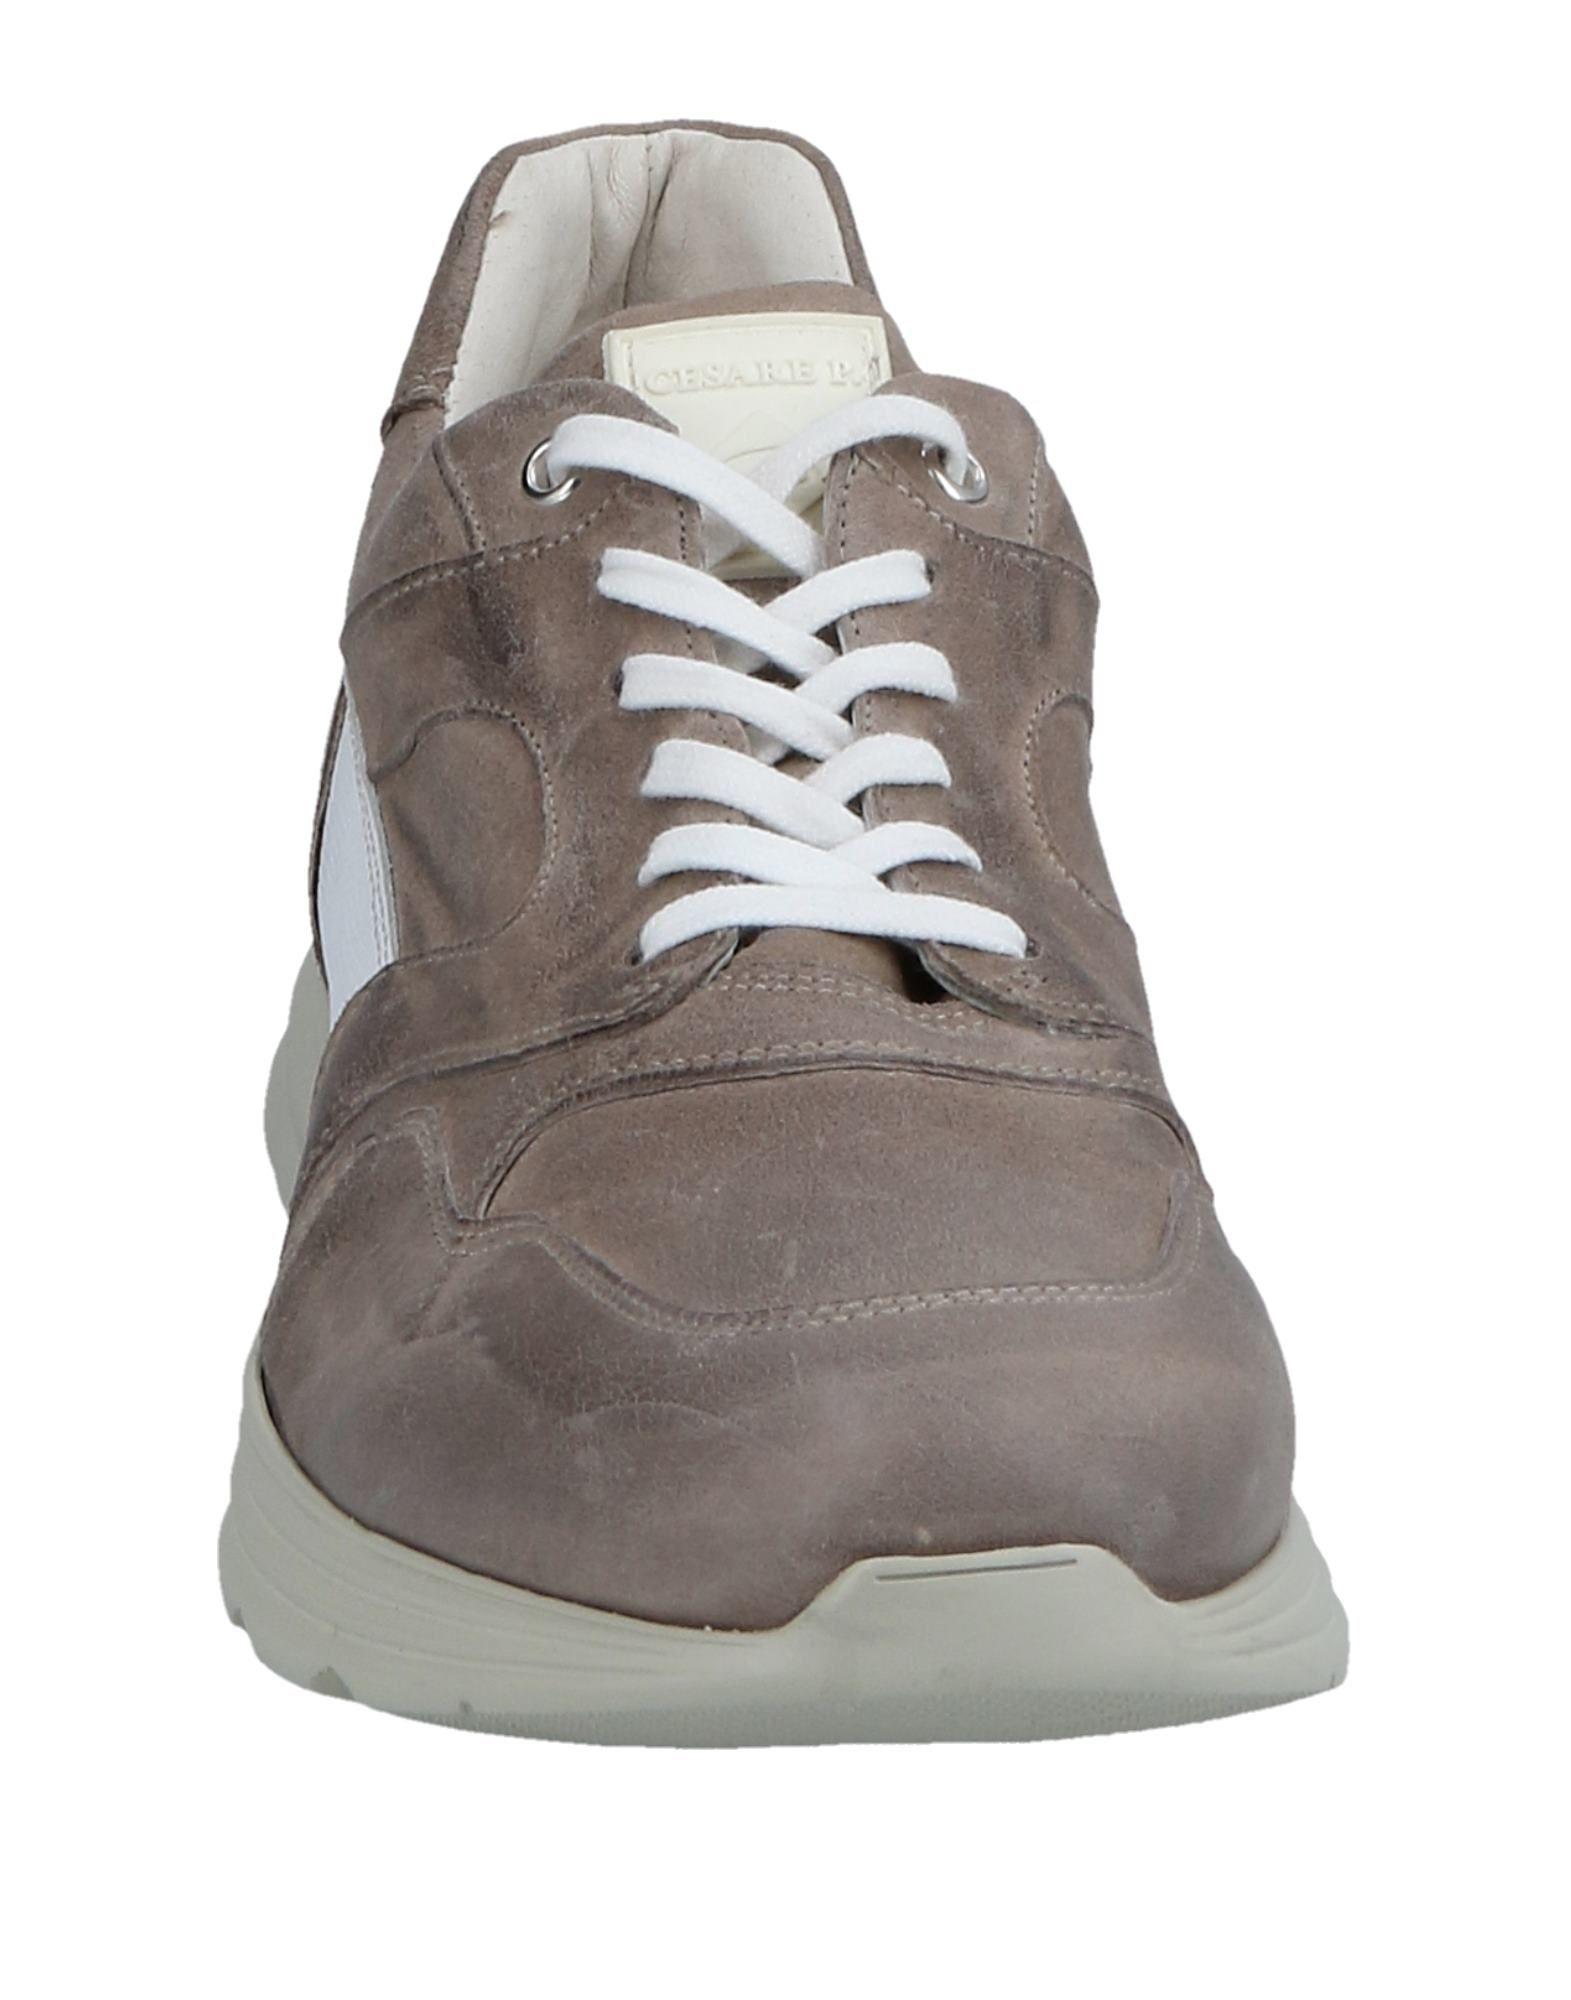 Cesare P. Sneakers Qualität Herren  11505046CL Gute Qualität Sneakers beliebte Schuhe a1eae9